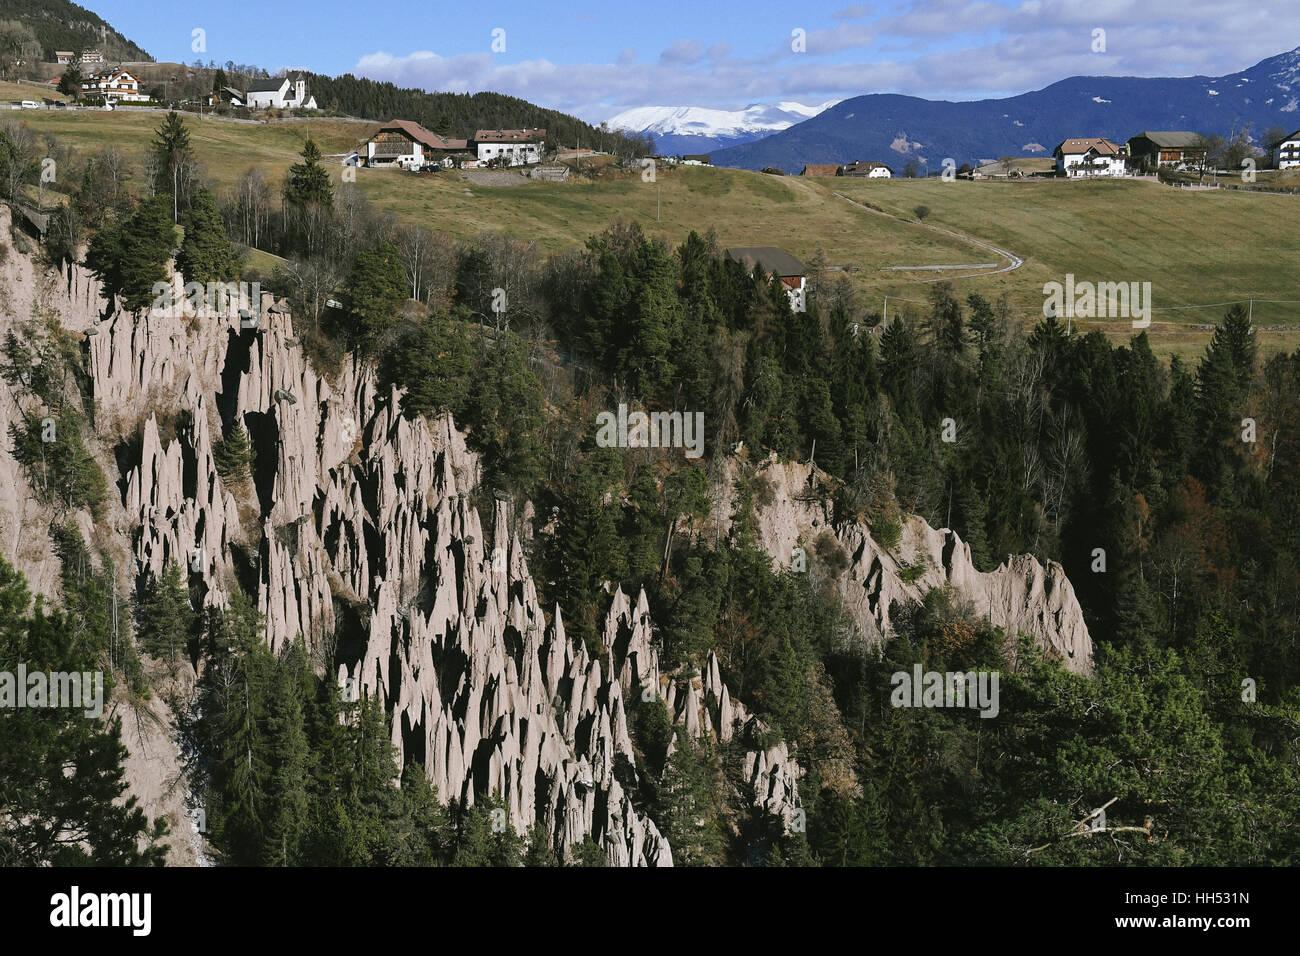 Ver a Ritten, Tirol del Sur, Italia, pirámides de tierra Imagen De Stock